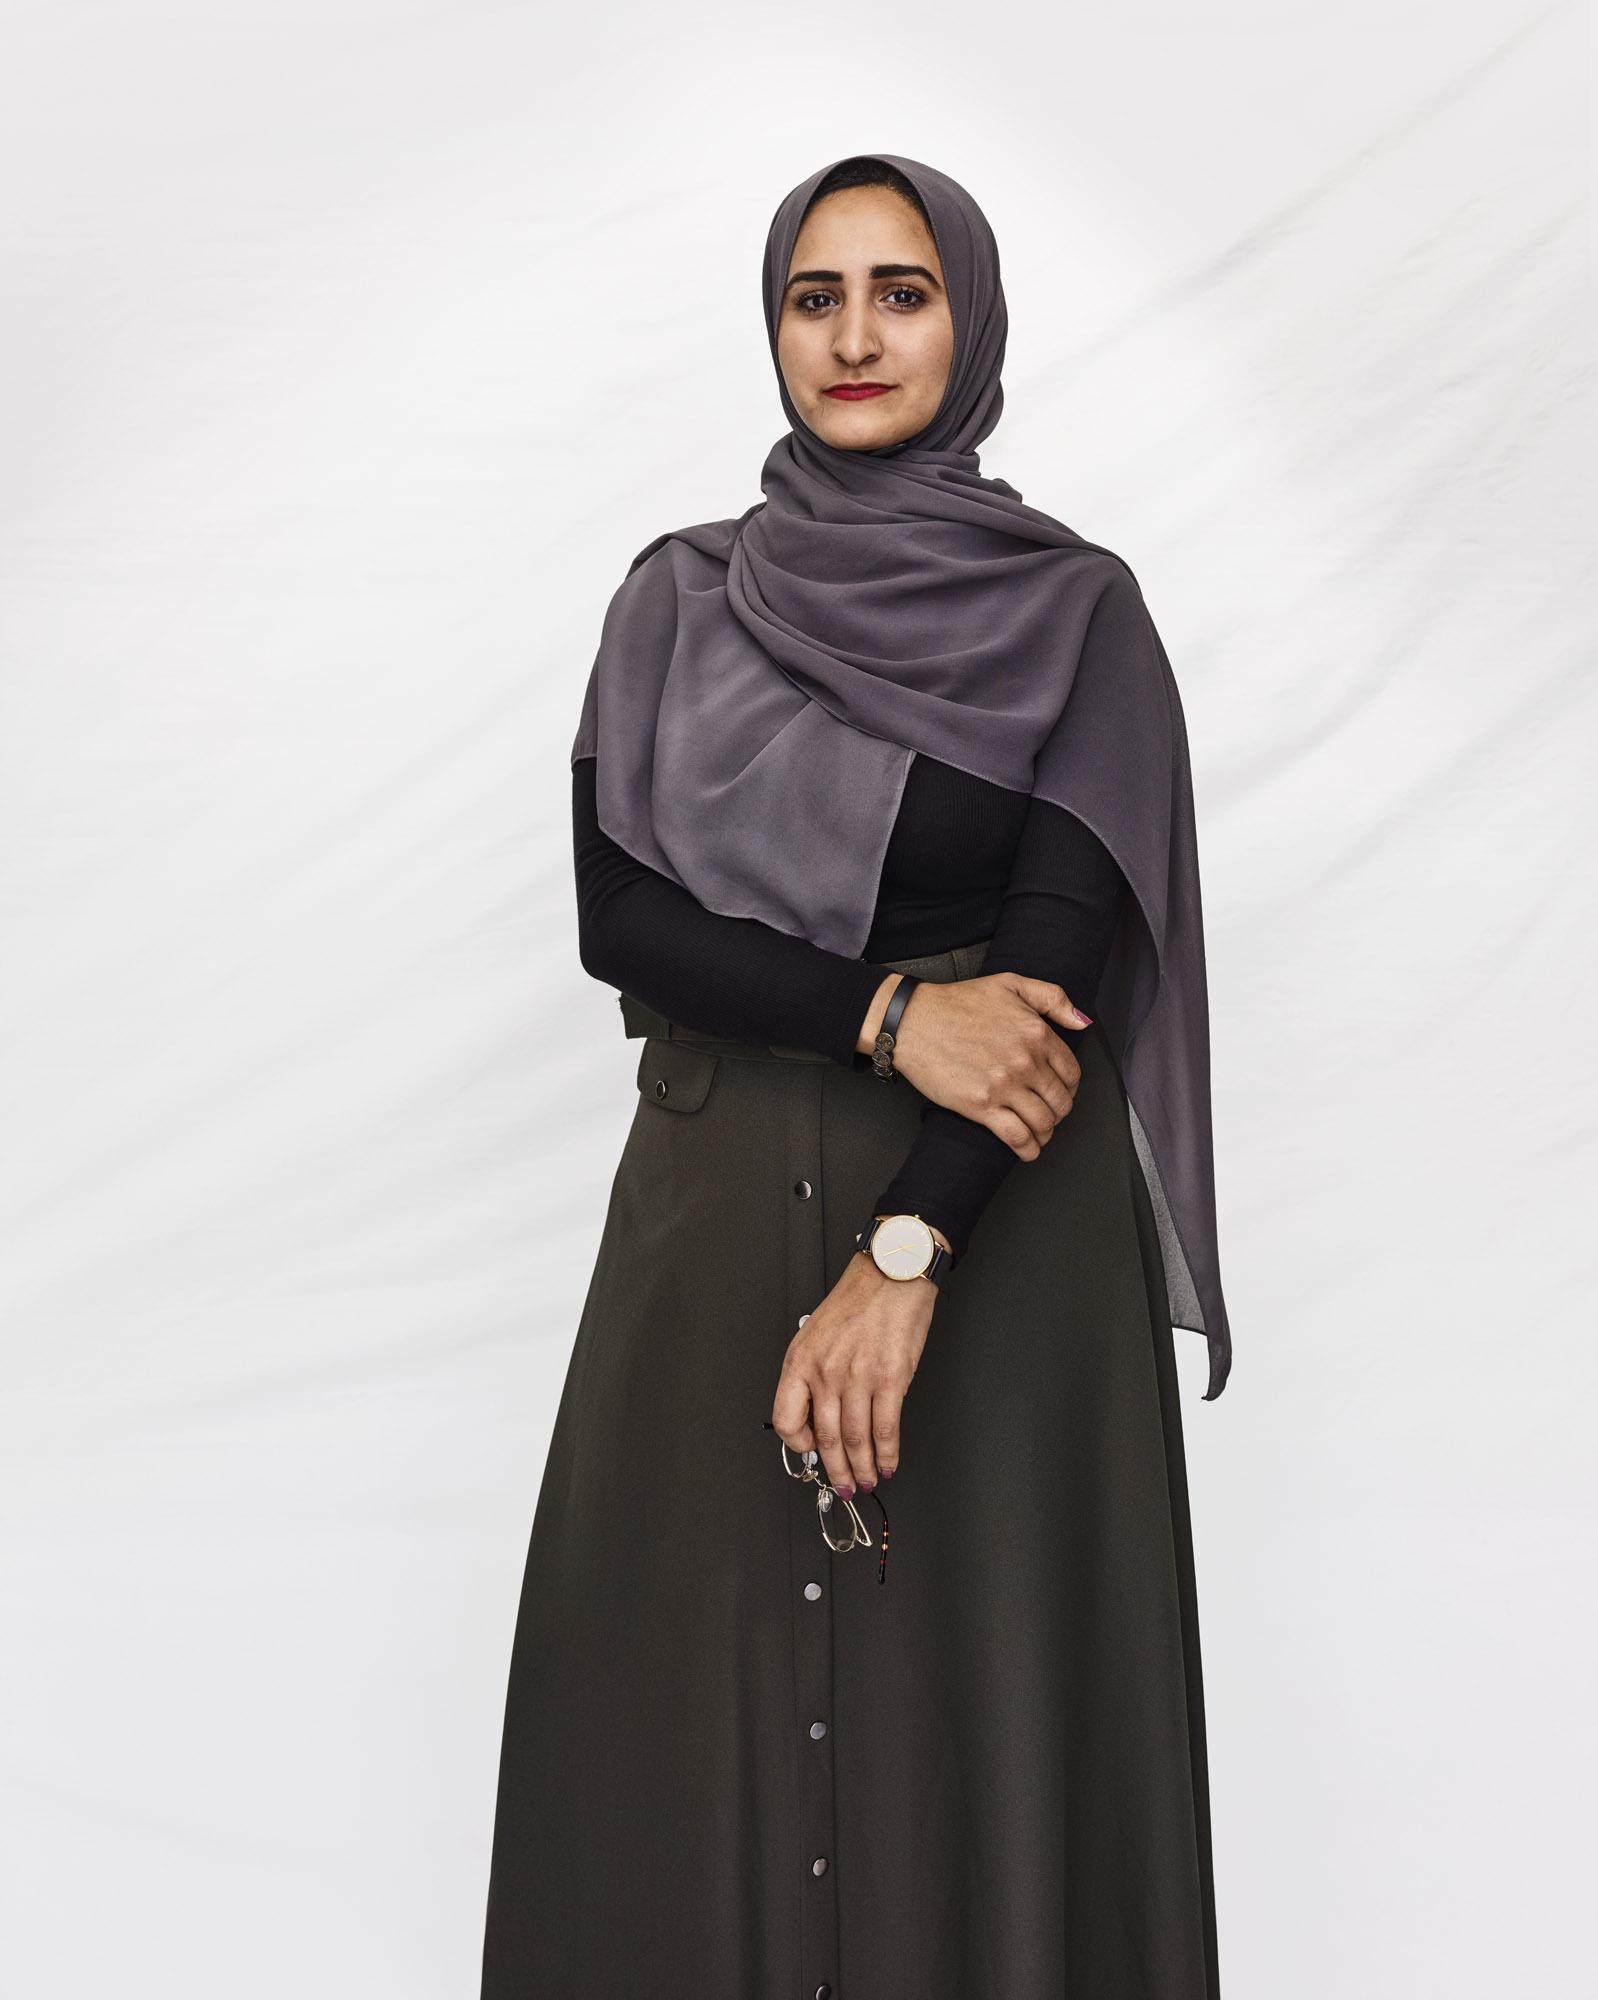 Hanan Ali Yahya